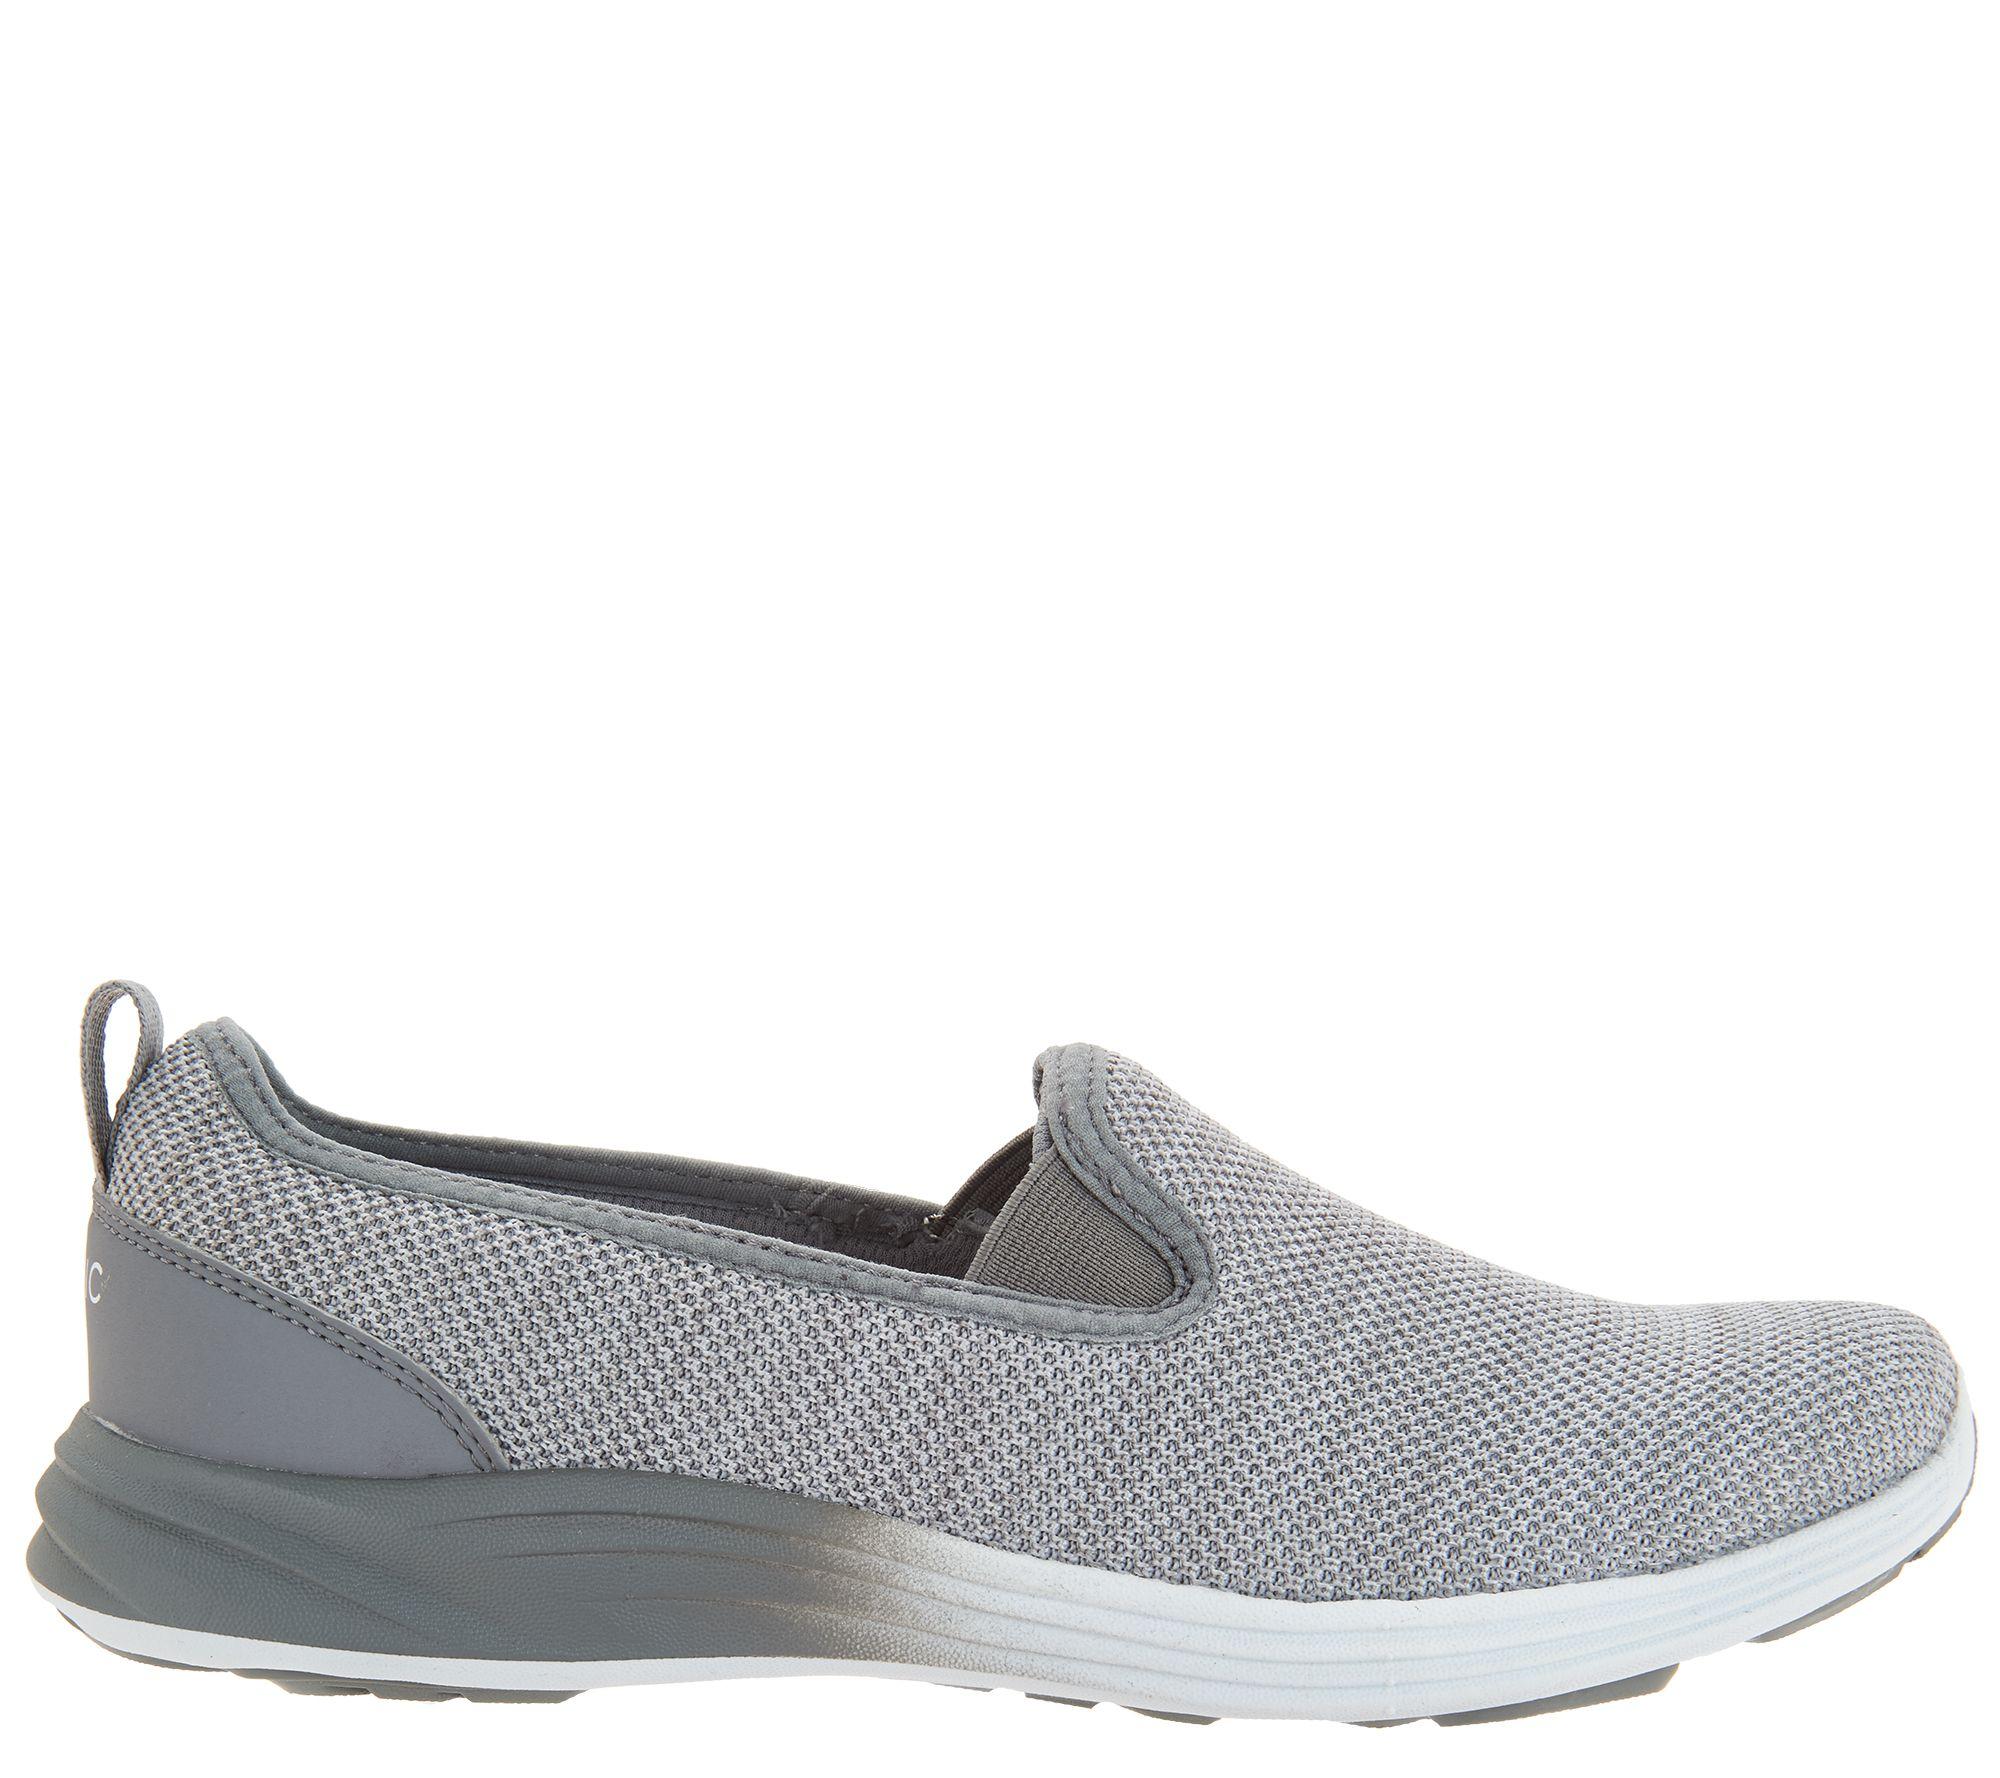 5ef44fb85323 Vionic Flat-knit Slip-On Shoes - Delaney - Page 1 — QVC.com